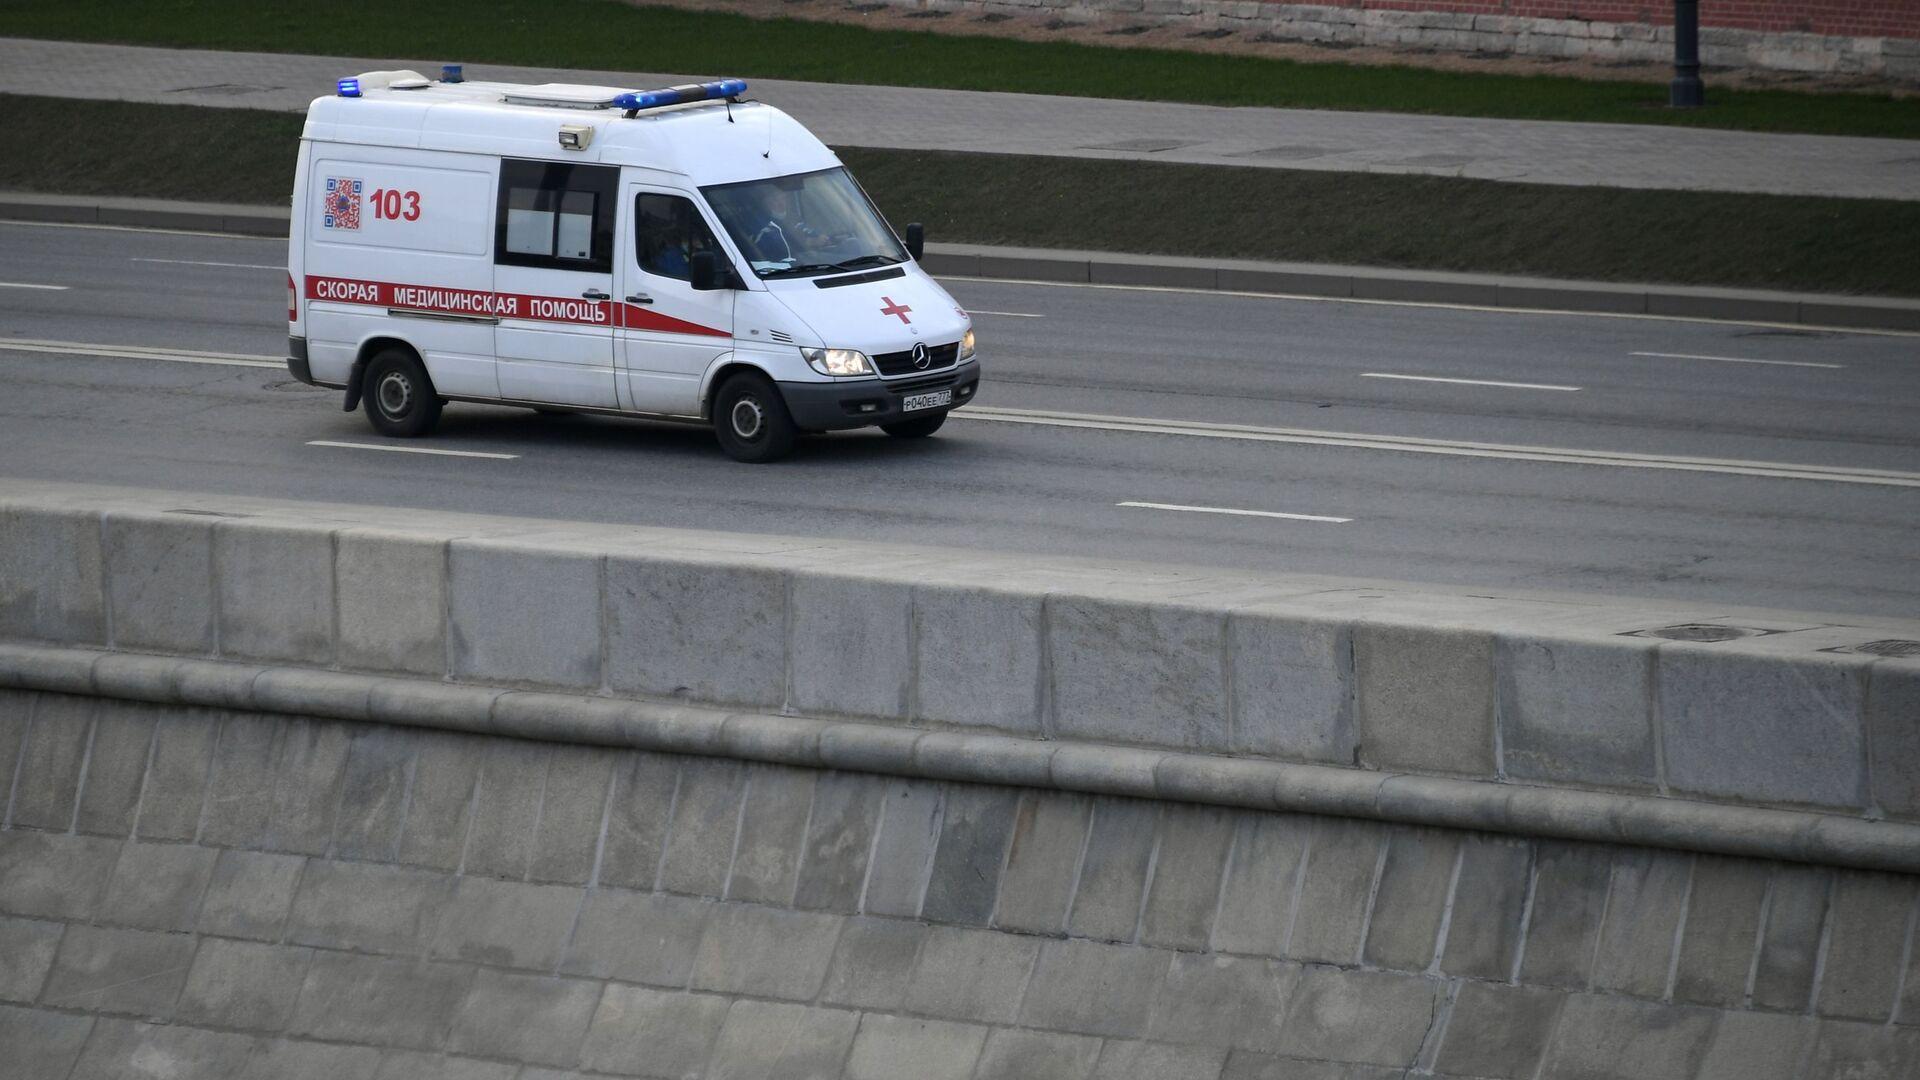 Ambulancia en Moscú - Sputnik Mundo, 1920, 29.03.2021